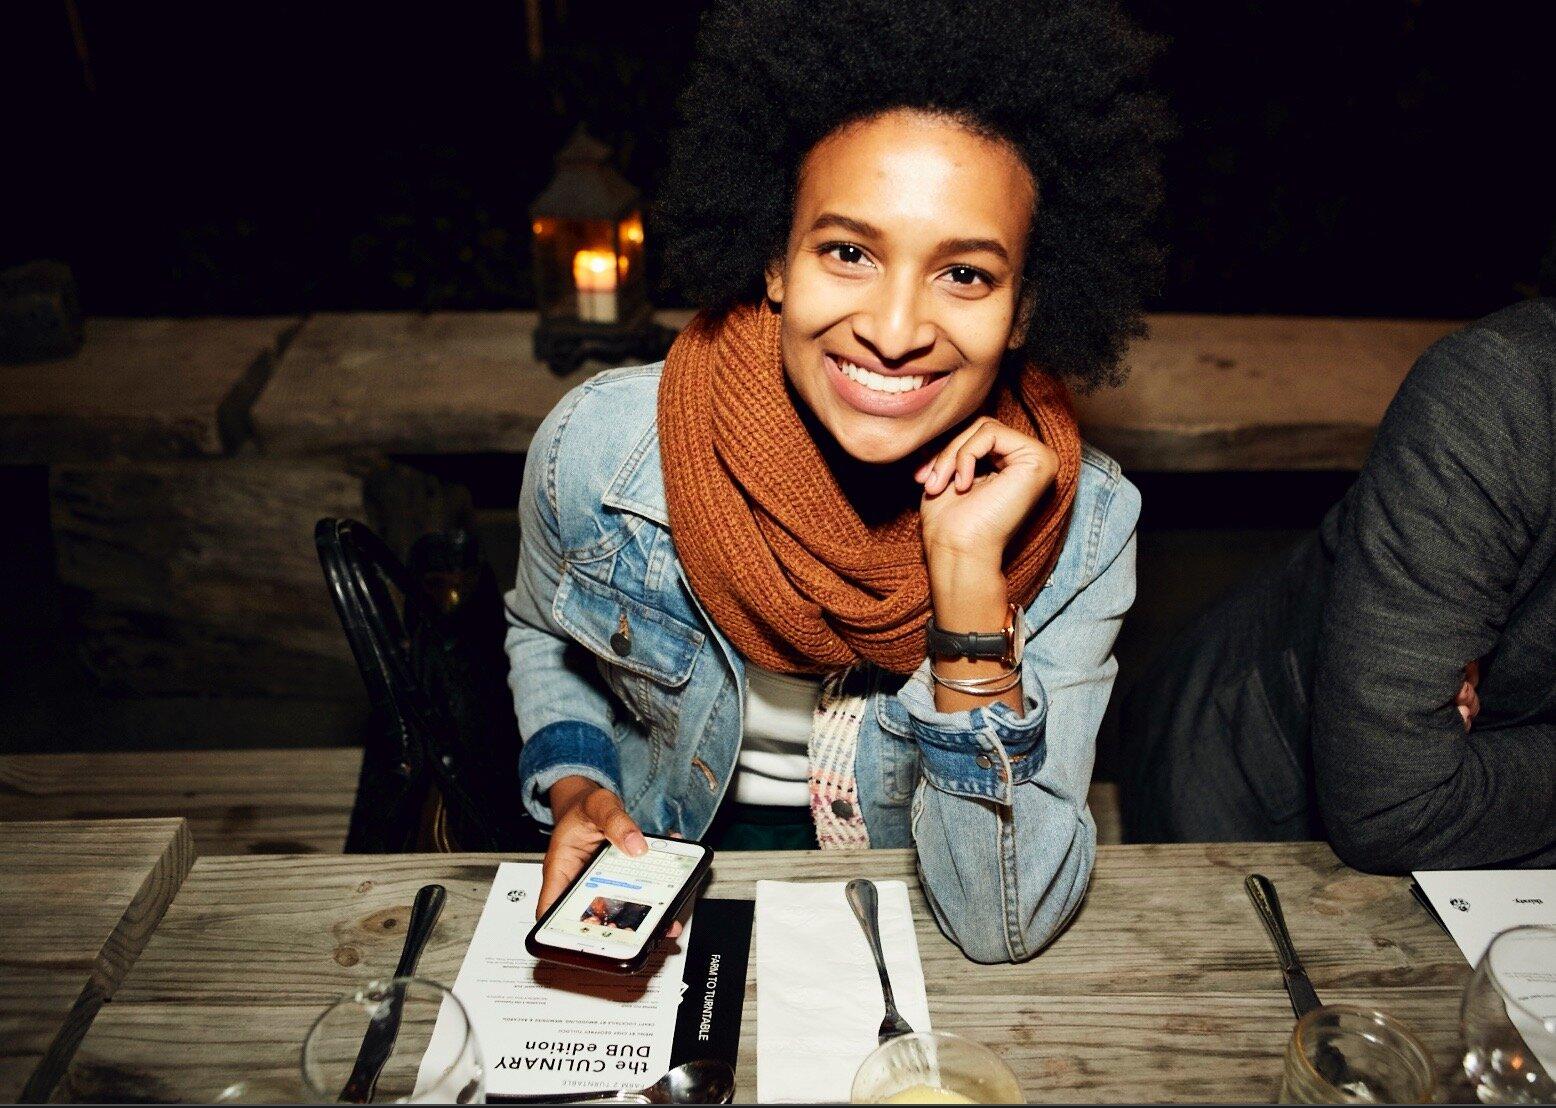 Influencer Marketing Manager, bread & Butter; Hospitality Consultant; Freelance Writer - Instagram @ShanikaHillocks